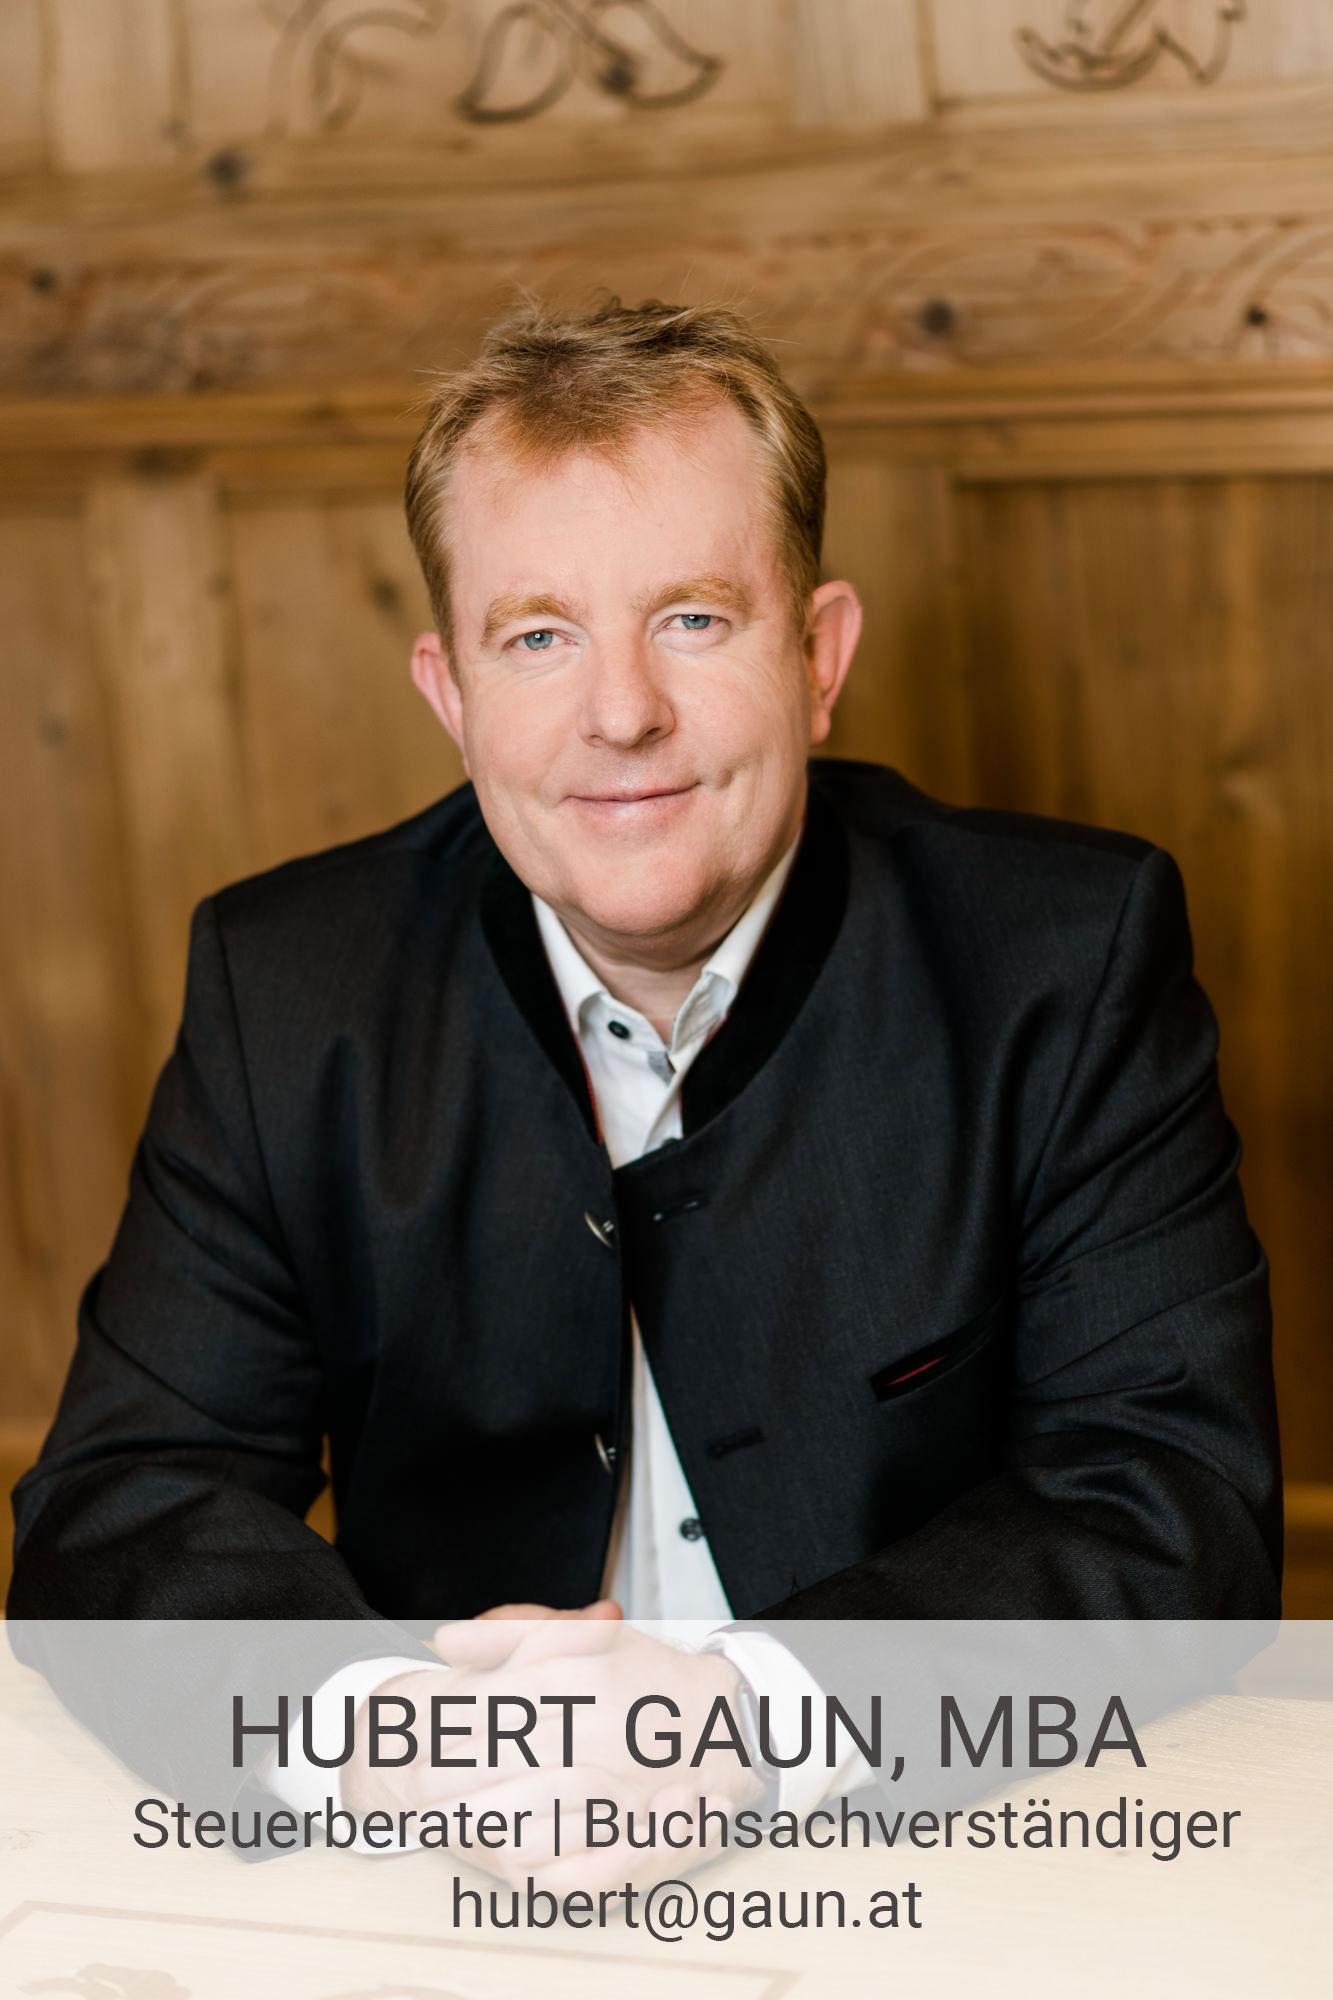 Hubert Gaun, MBA